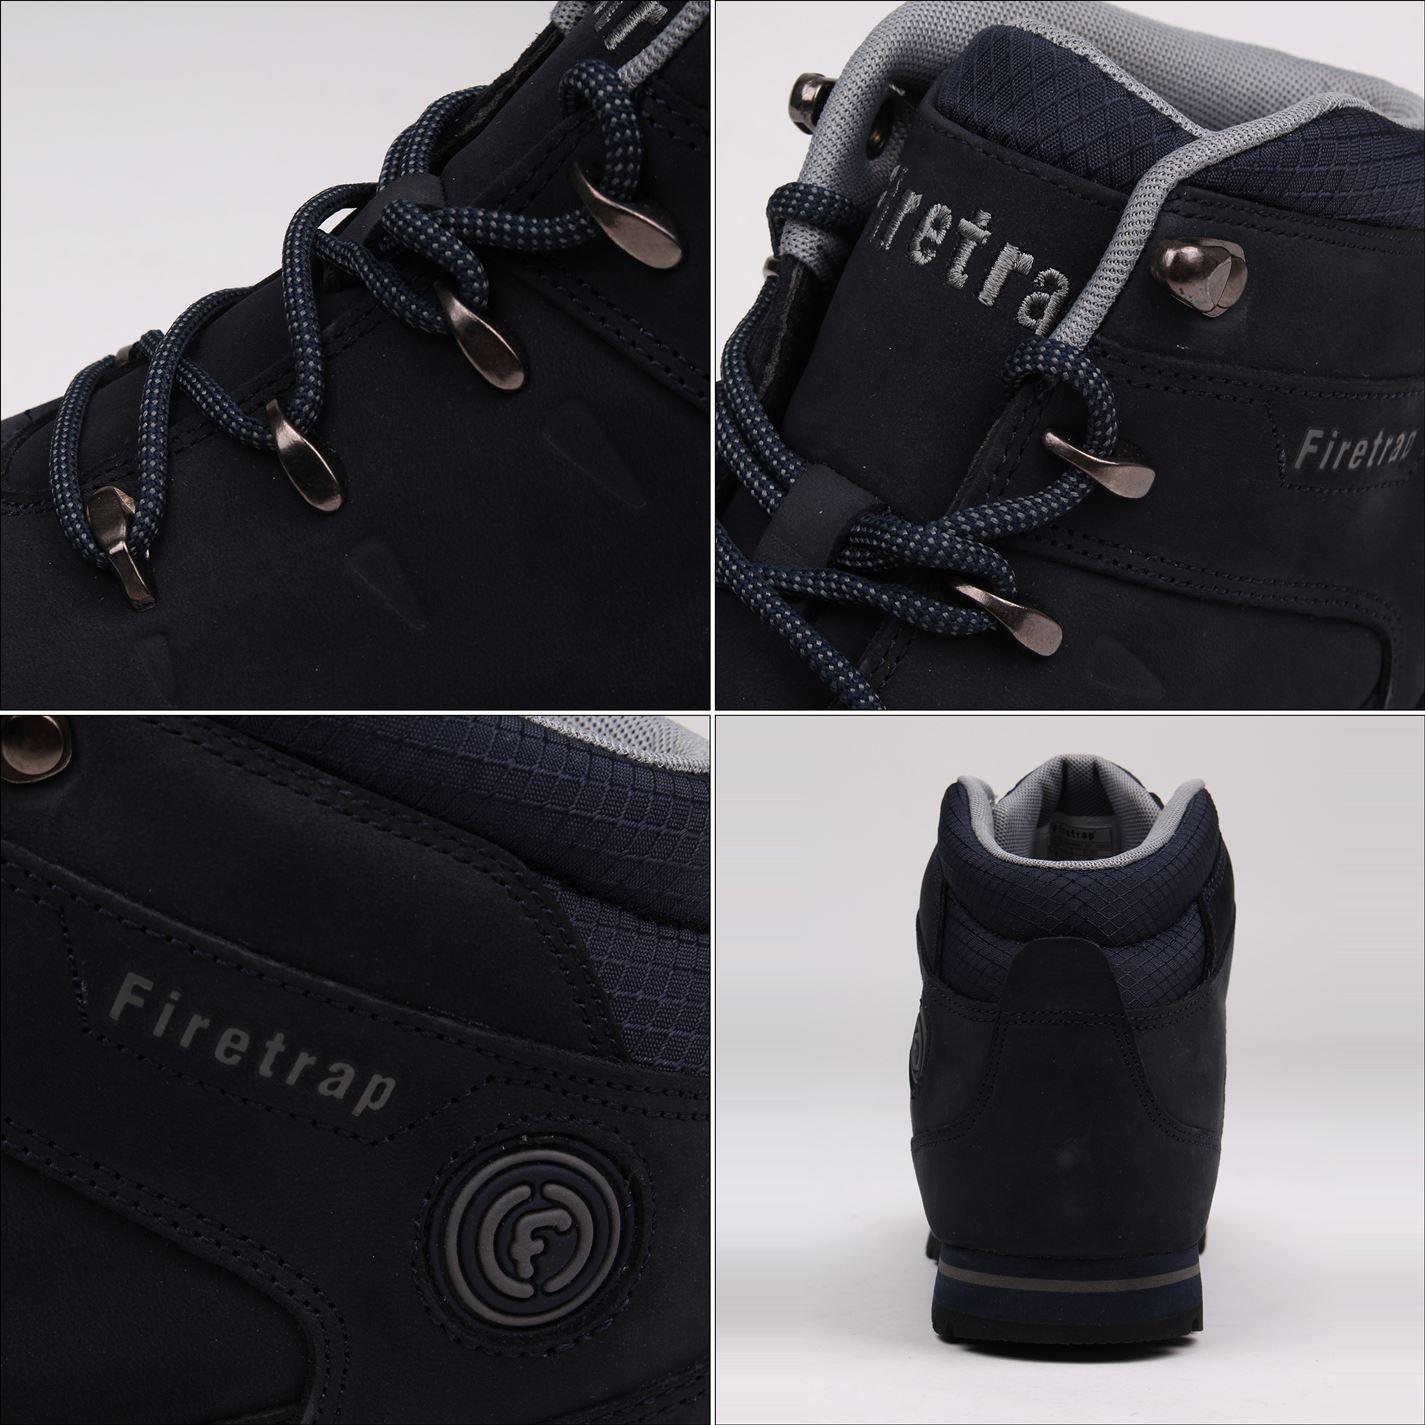 Firetrap Rhino Stiefel    Stiefel Herren Gents c5b410